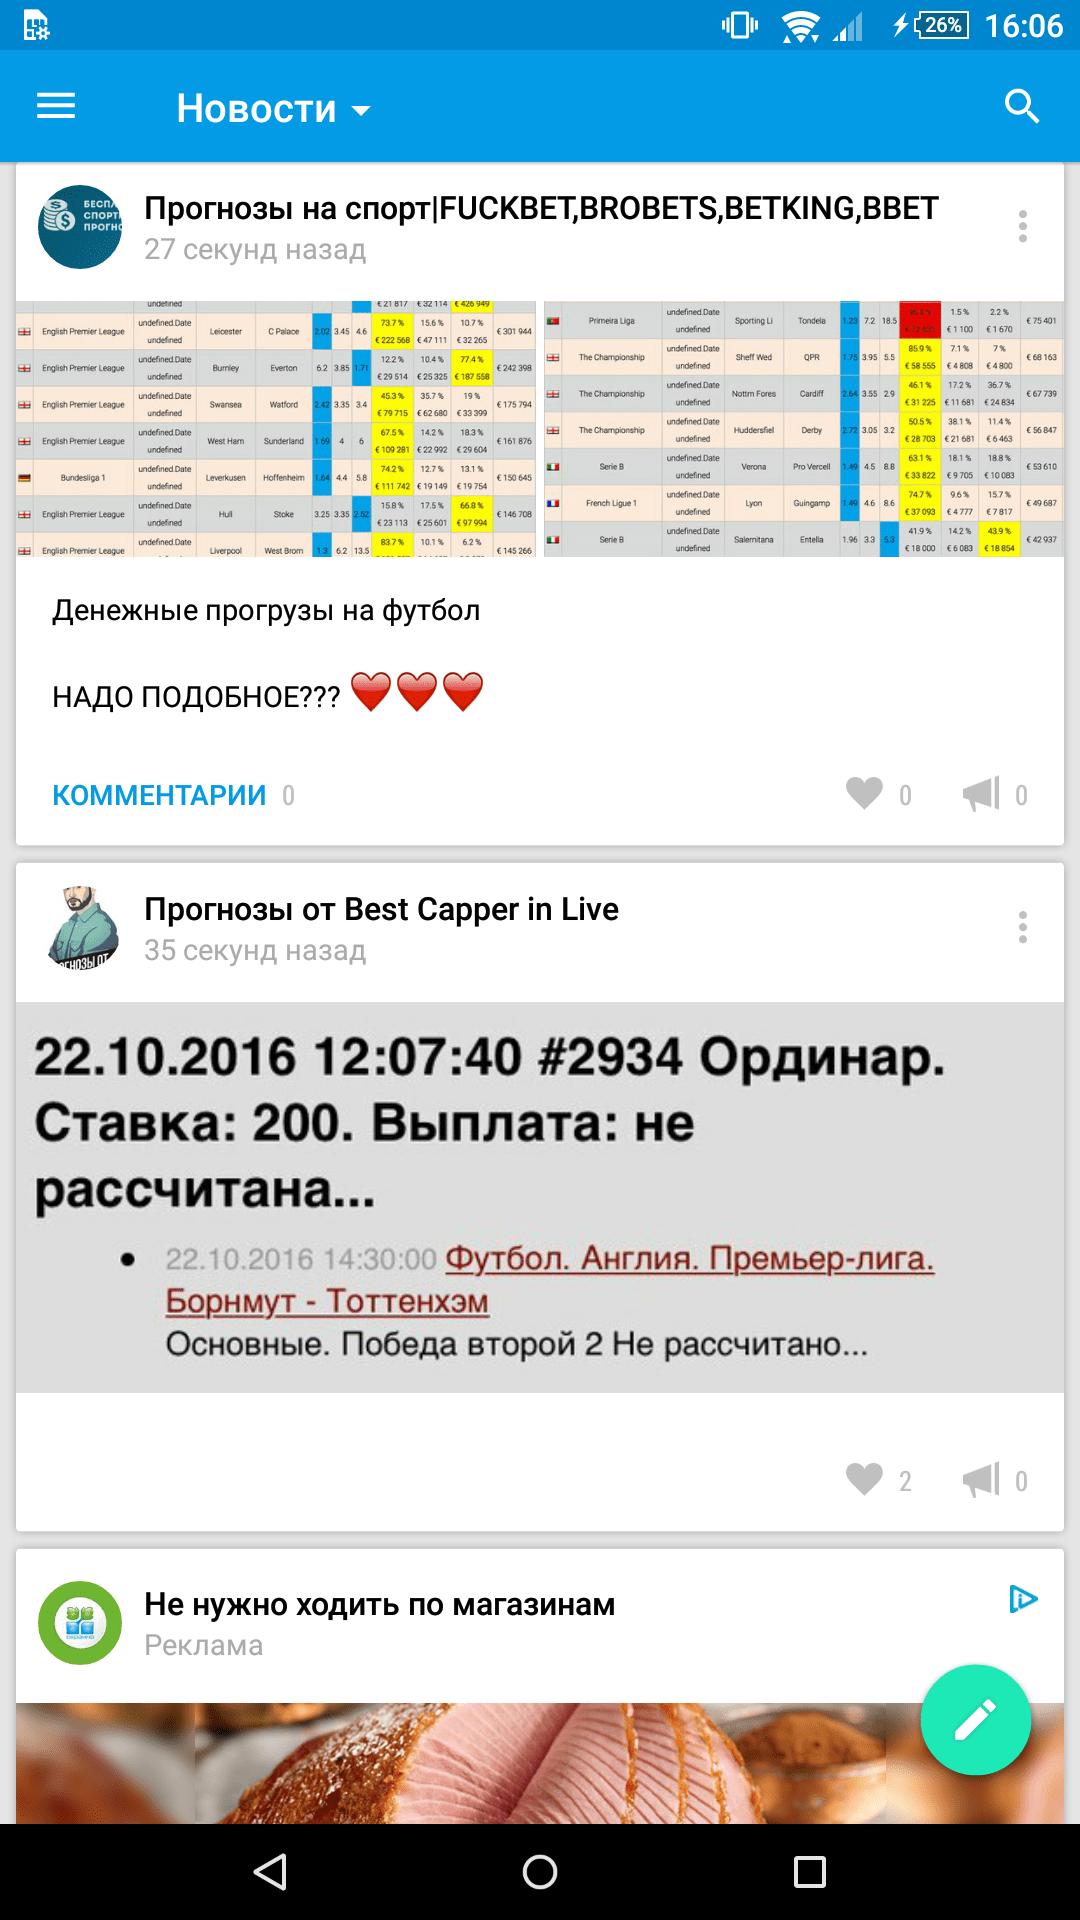 Ставки на спорт красноярск отзывы